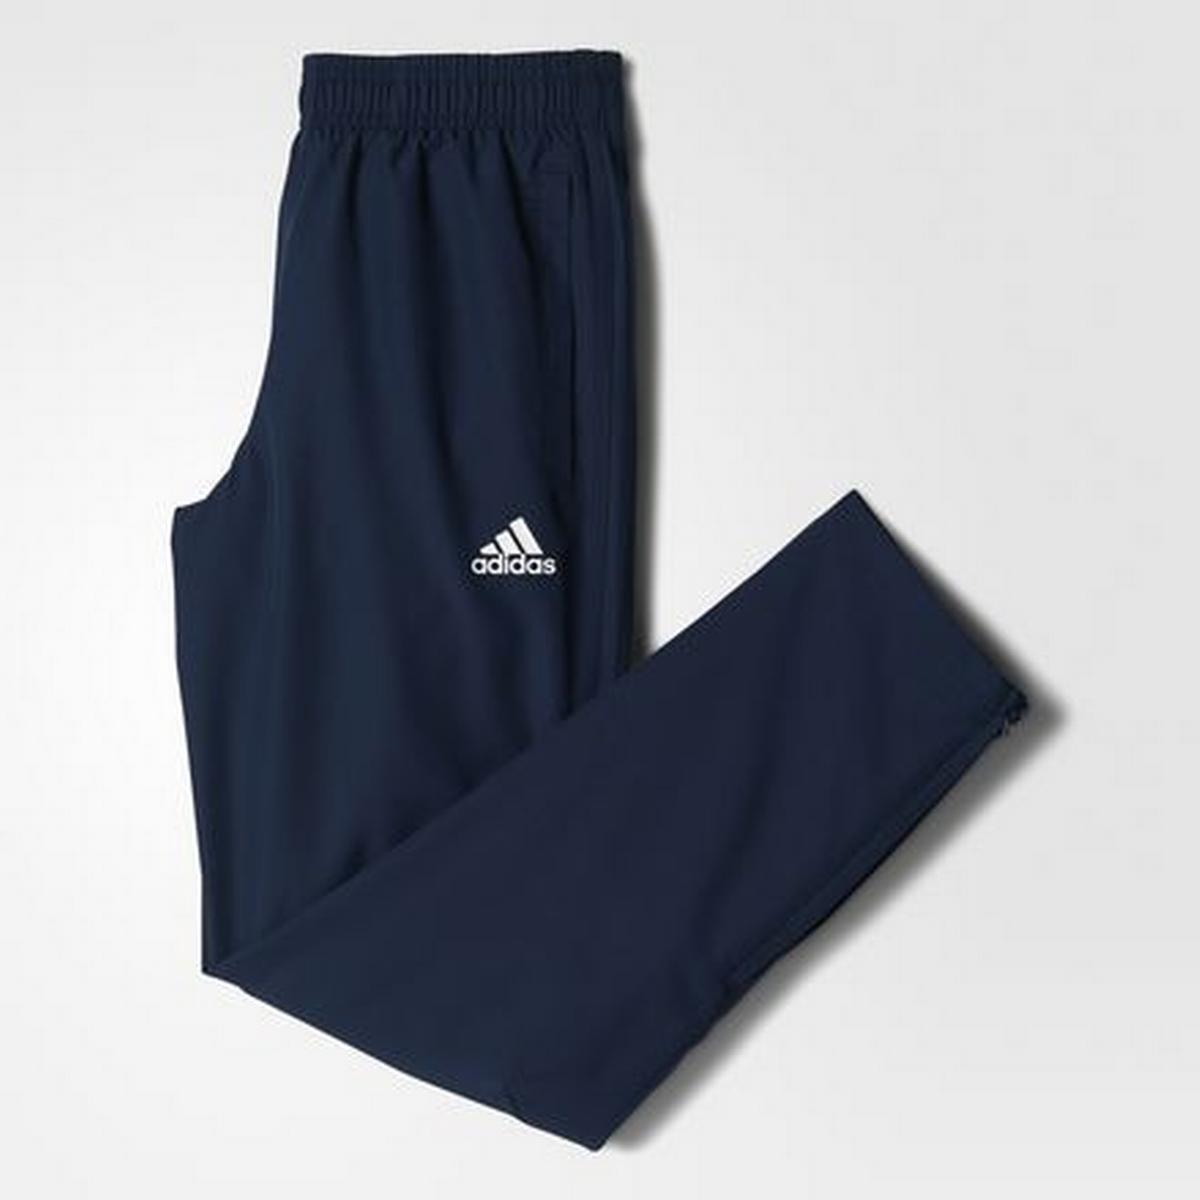 adidas bukser grønne striber, Adidas danmark adidas ultra